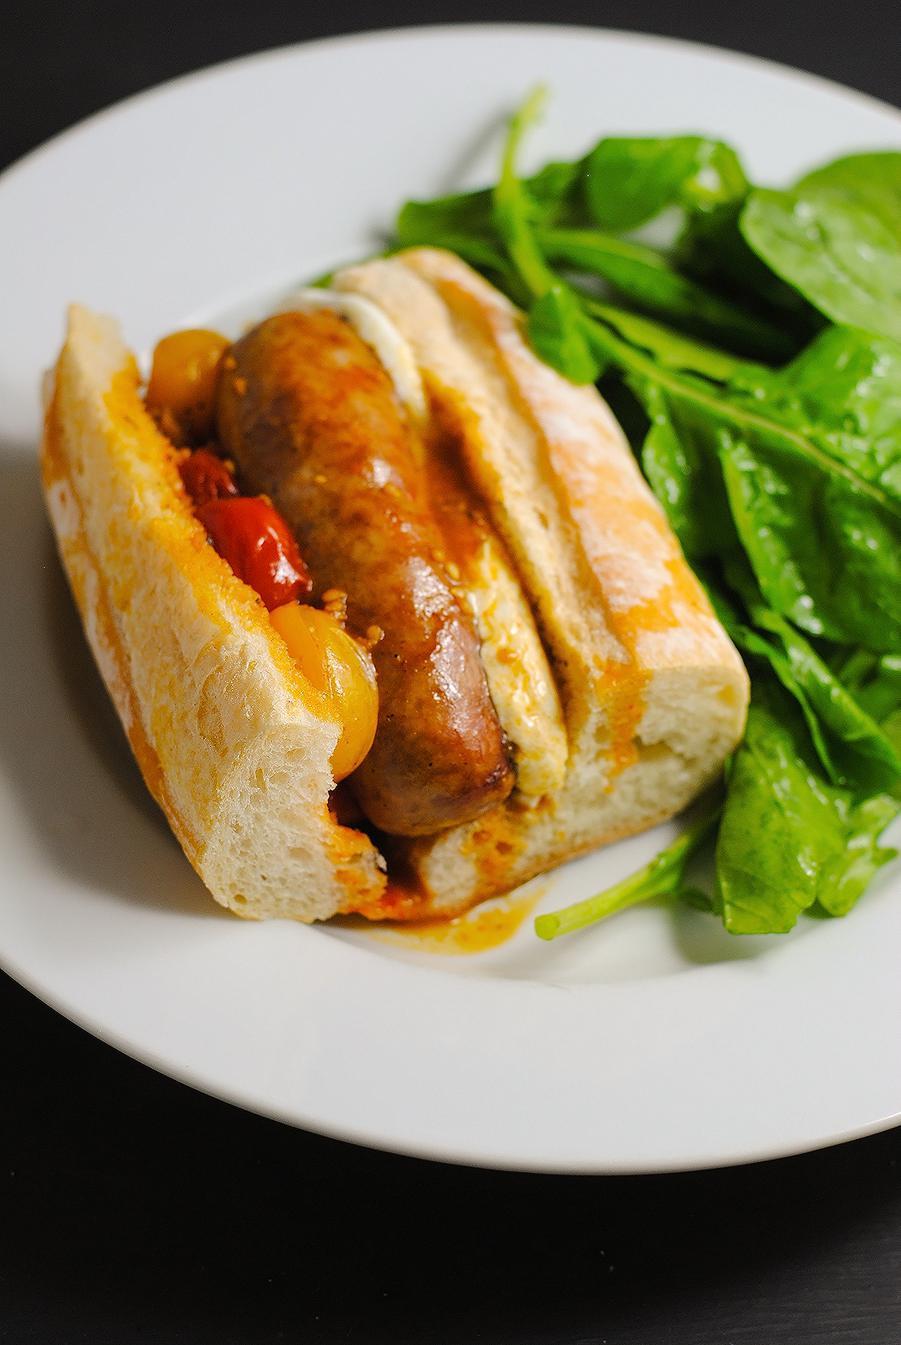 Italian sausage subs